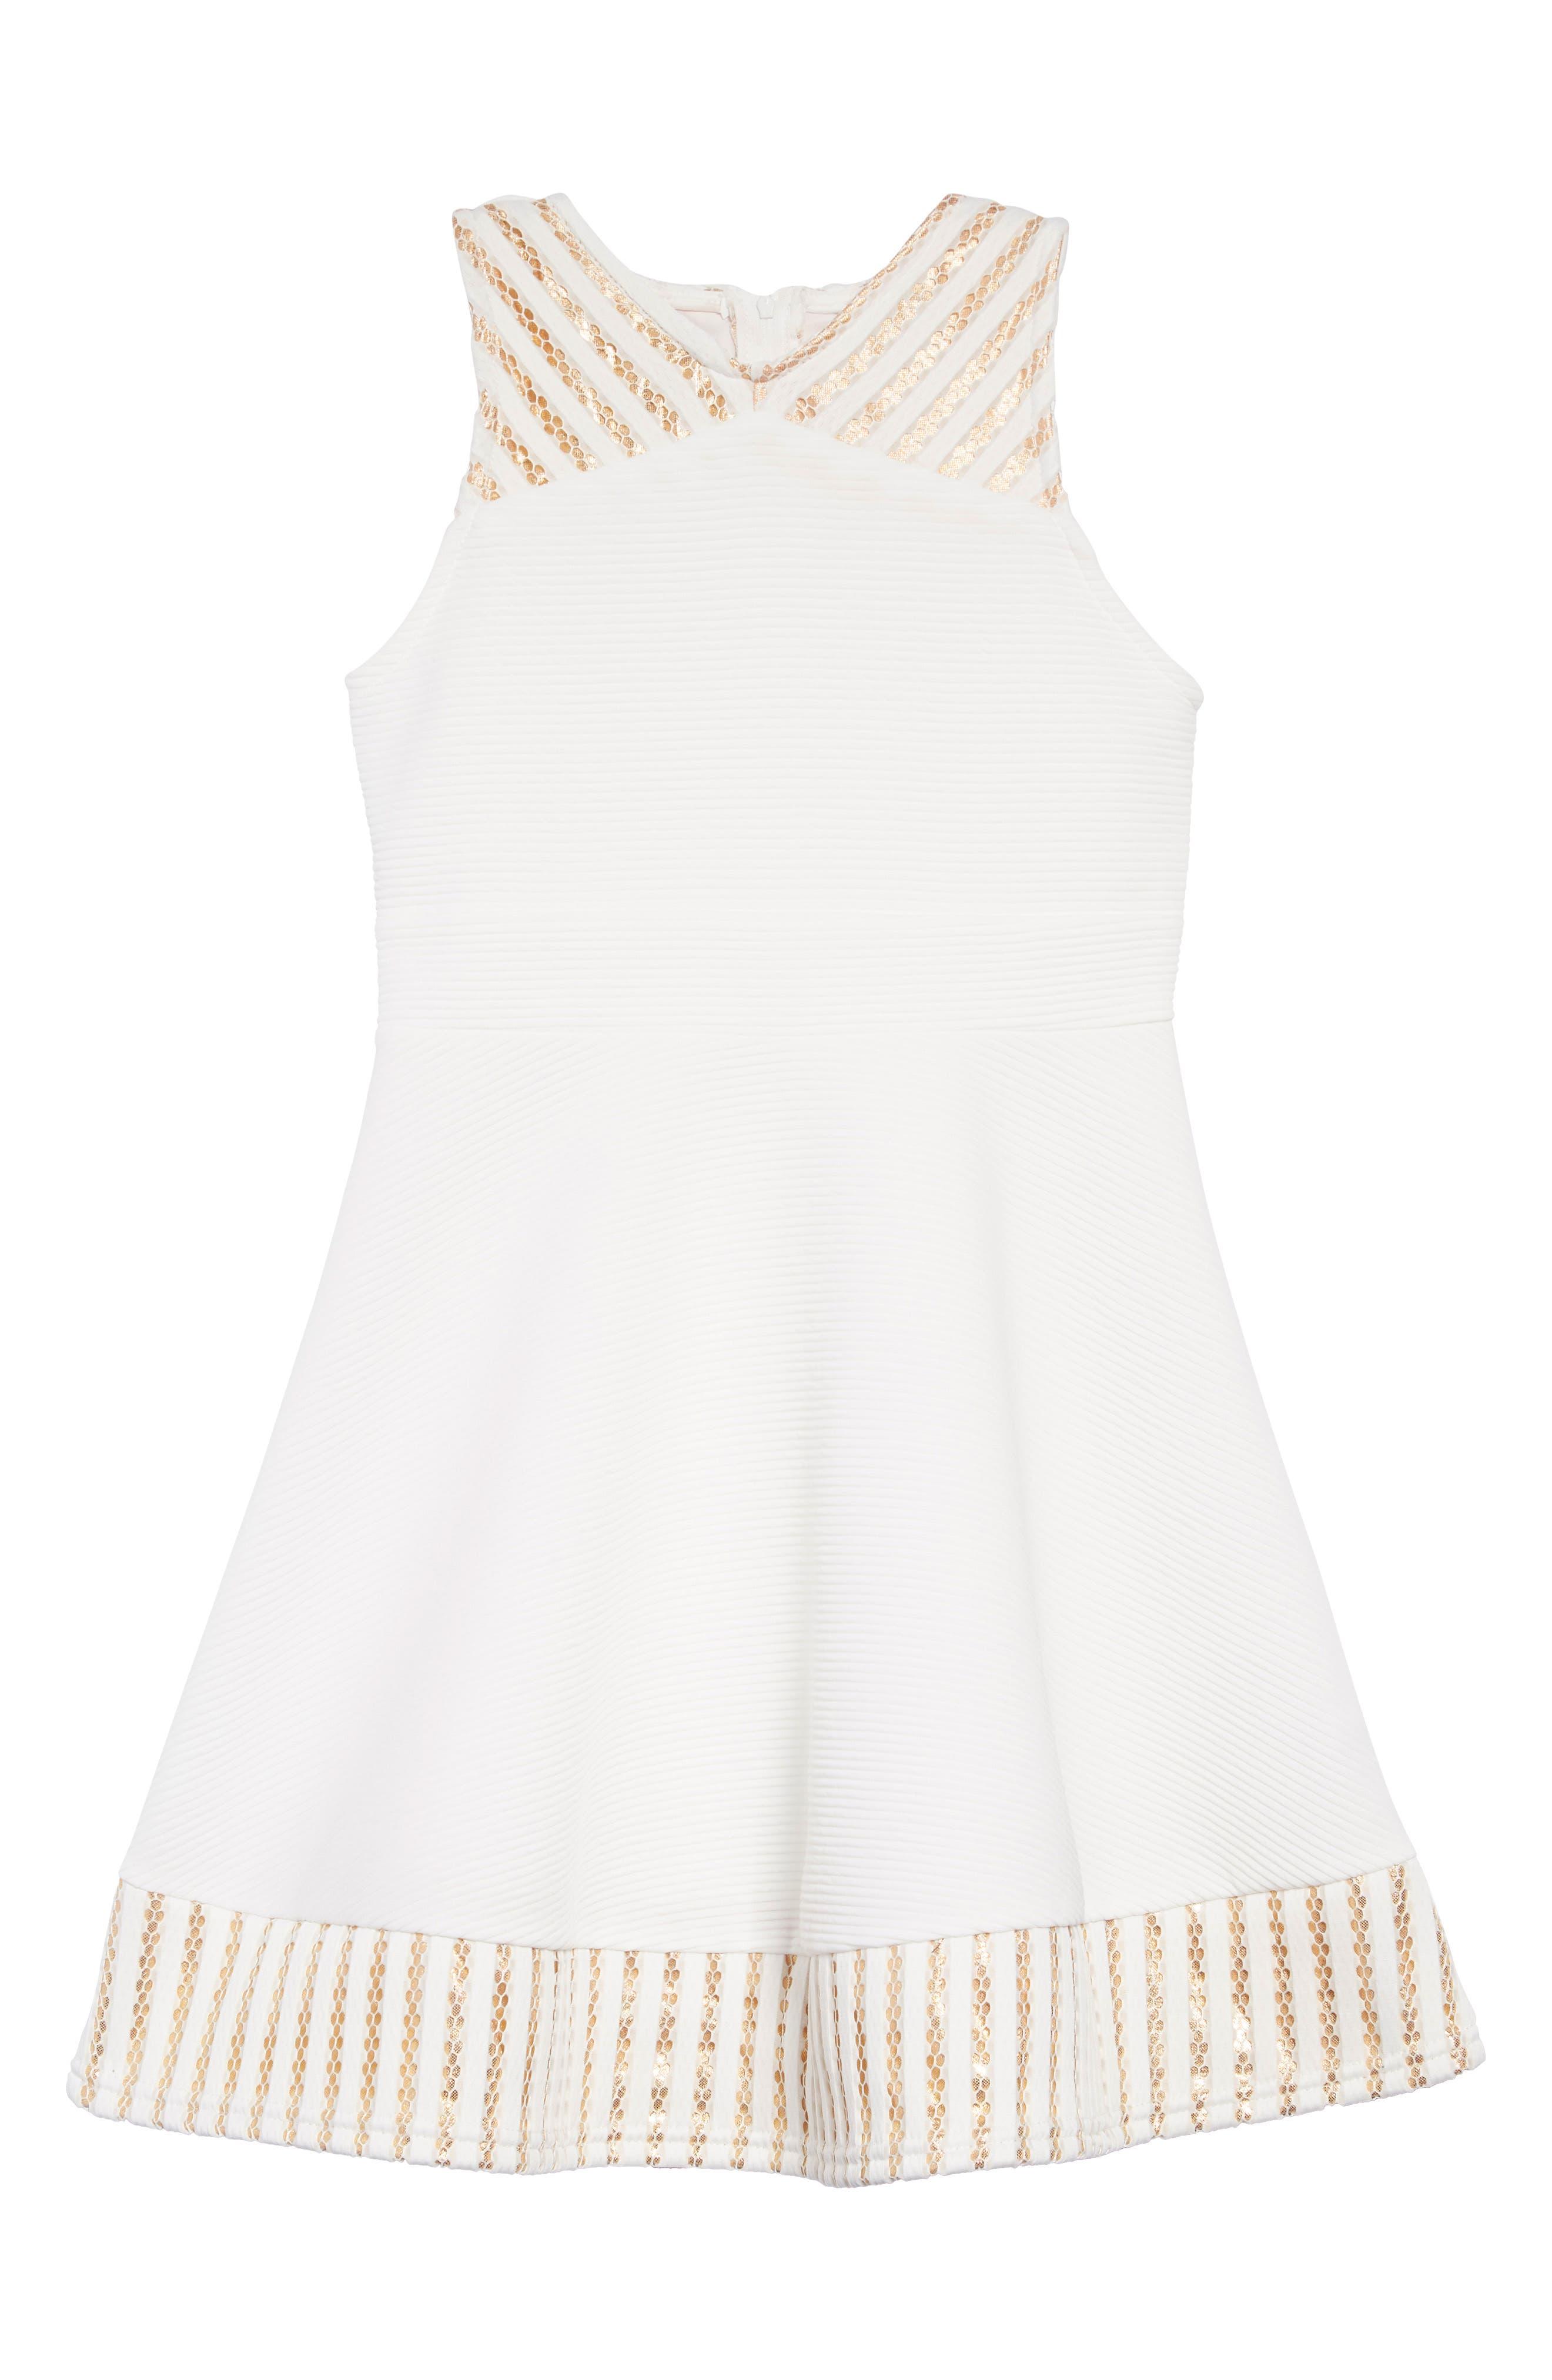 ZUNIE, Metallic Trim Ribbed Skater Dress, Main thumbnail 1, color, WHITE/GOLD